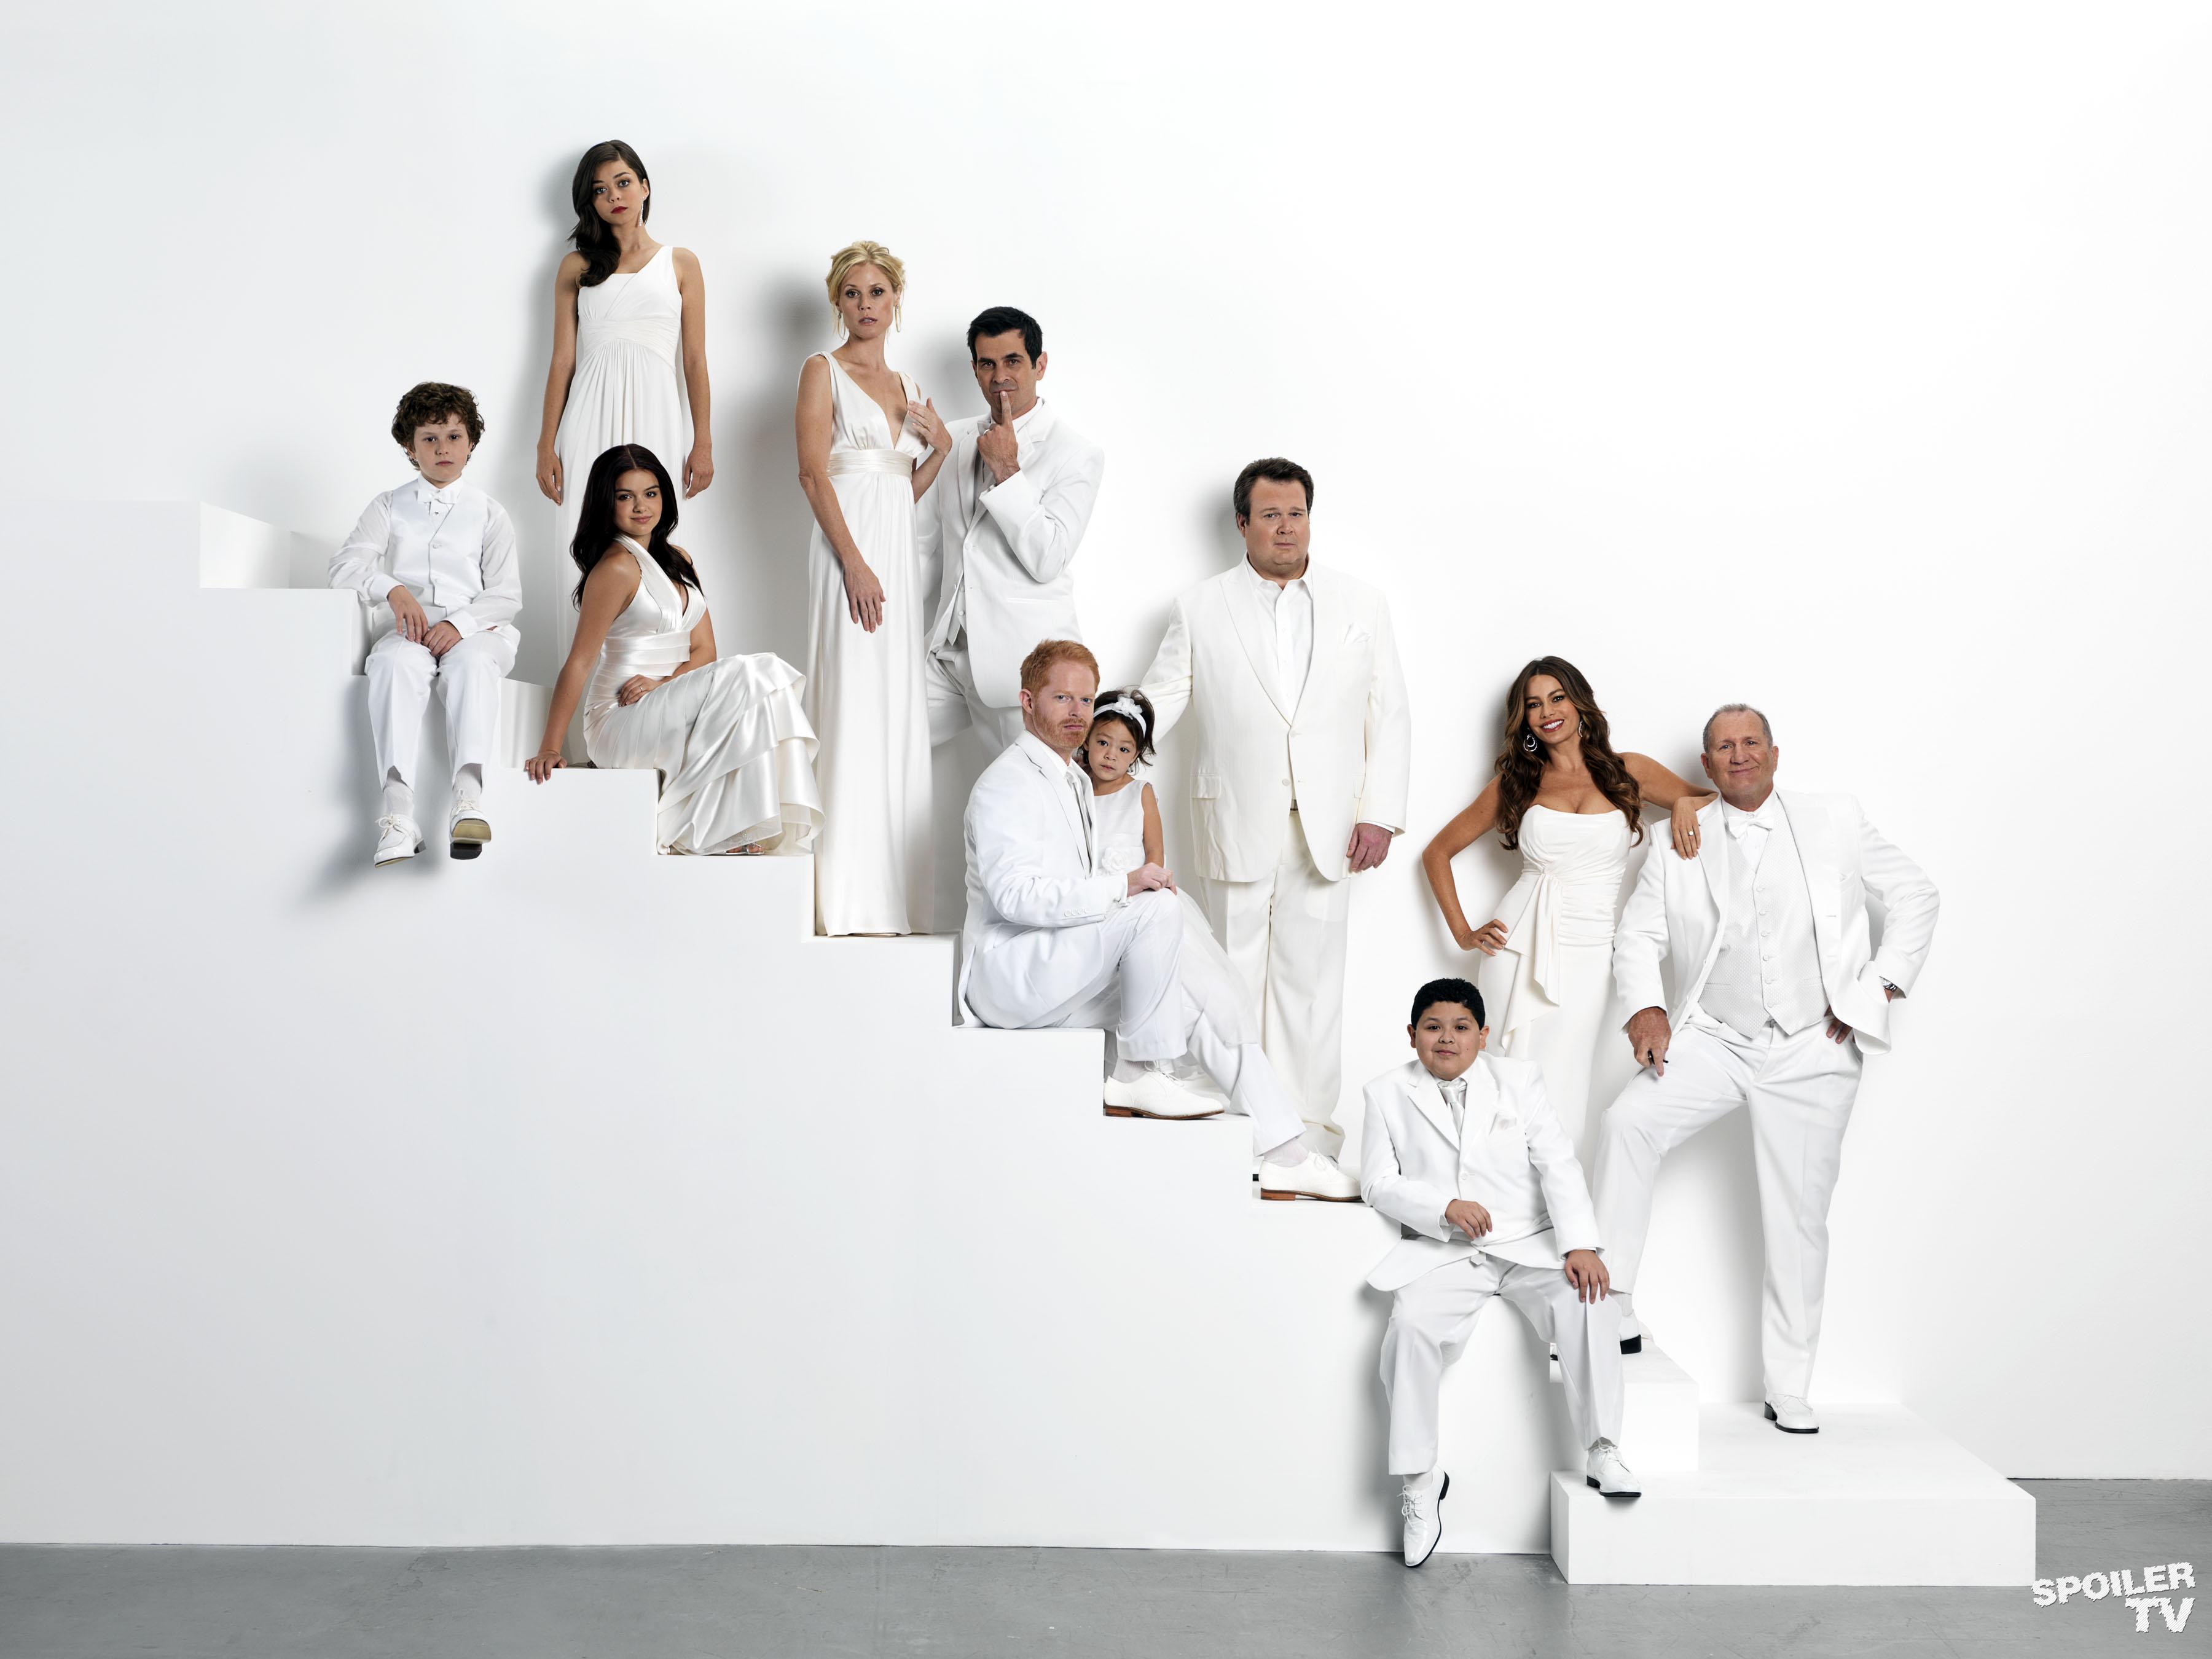 modern family images season 3 cast2 wallpaper photos 37540917